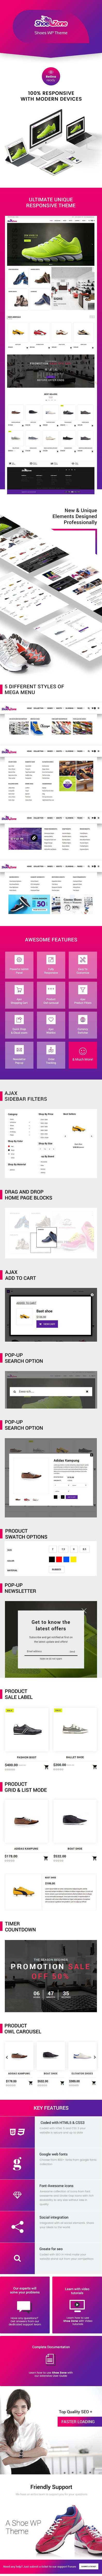 Shoe Store | Footwear Shoes Shopify Theme - 1